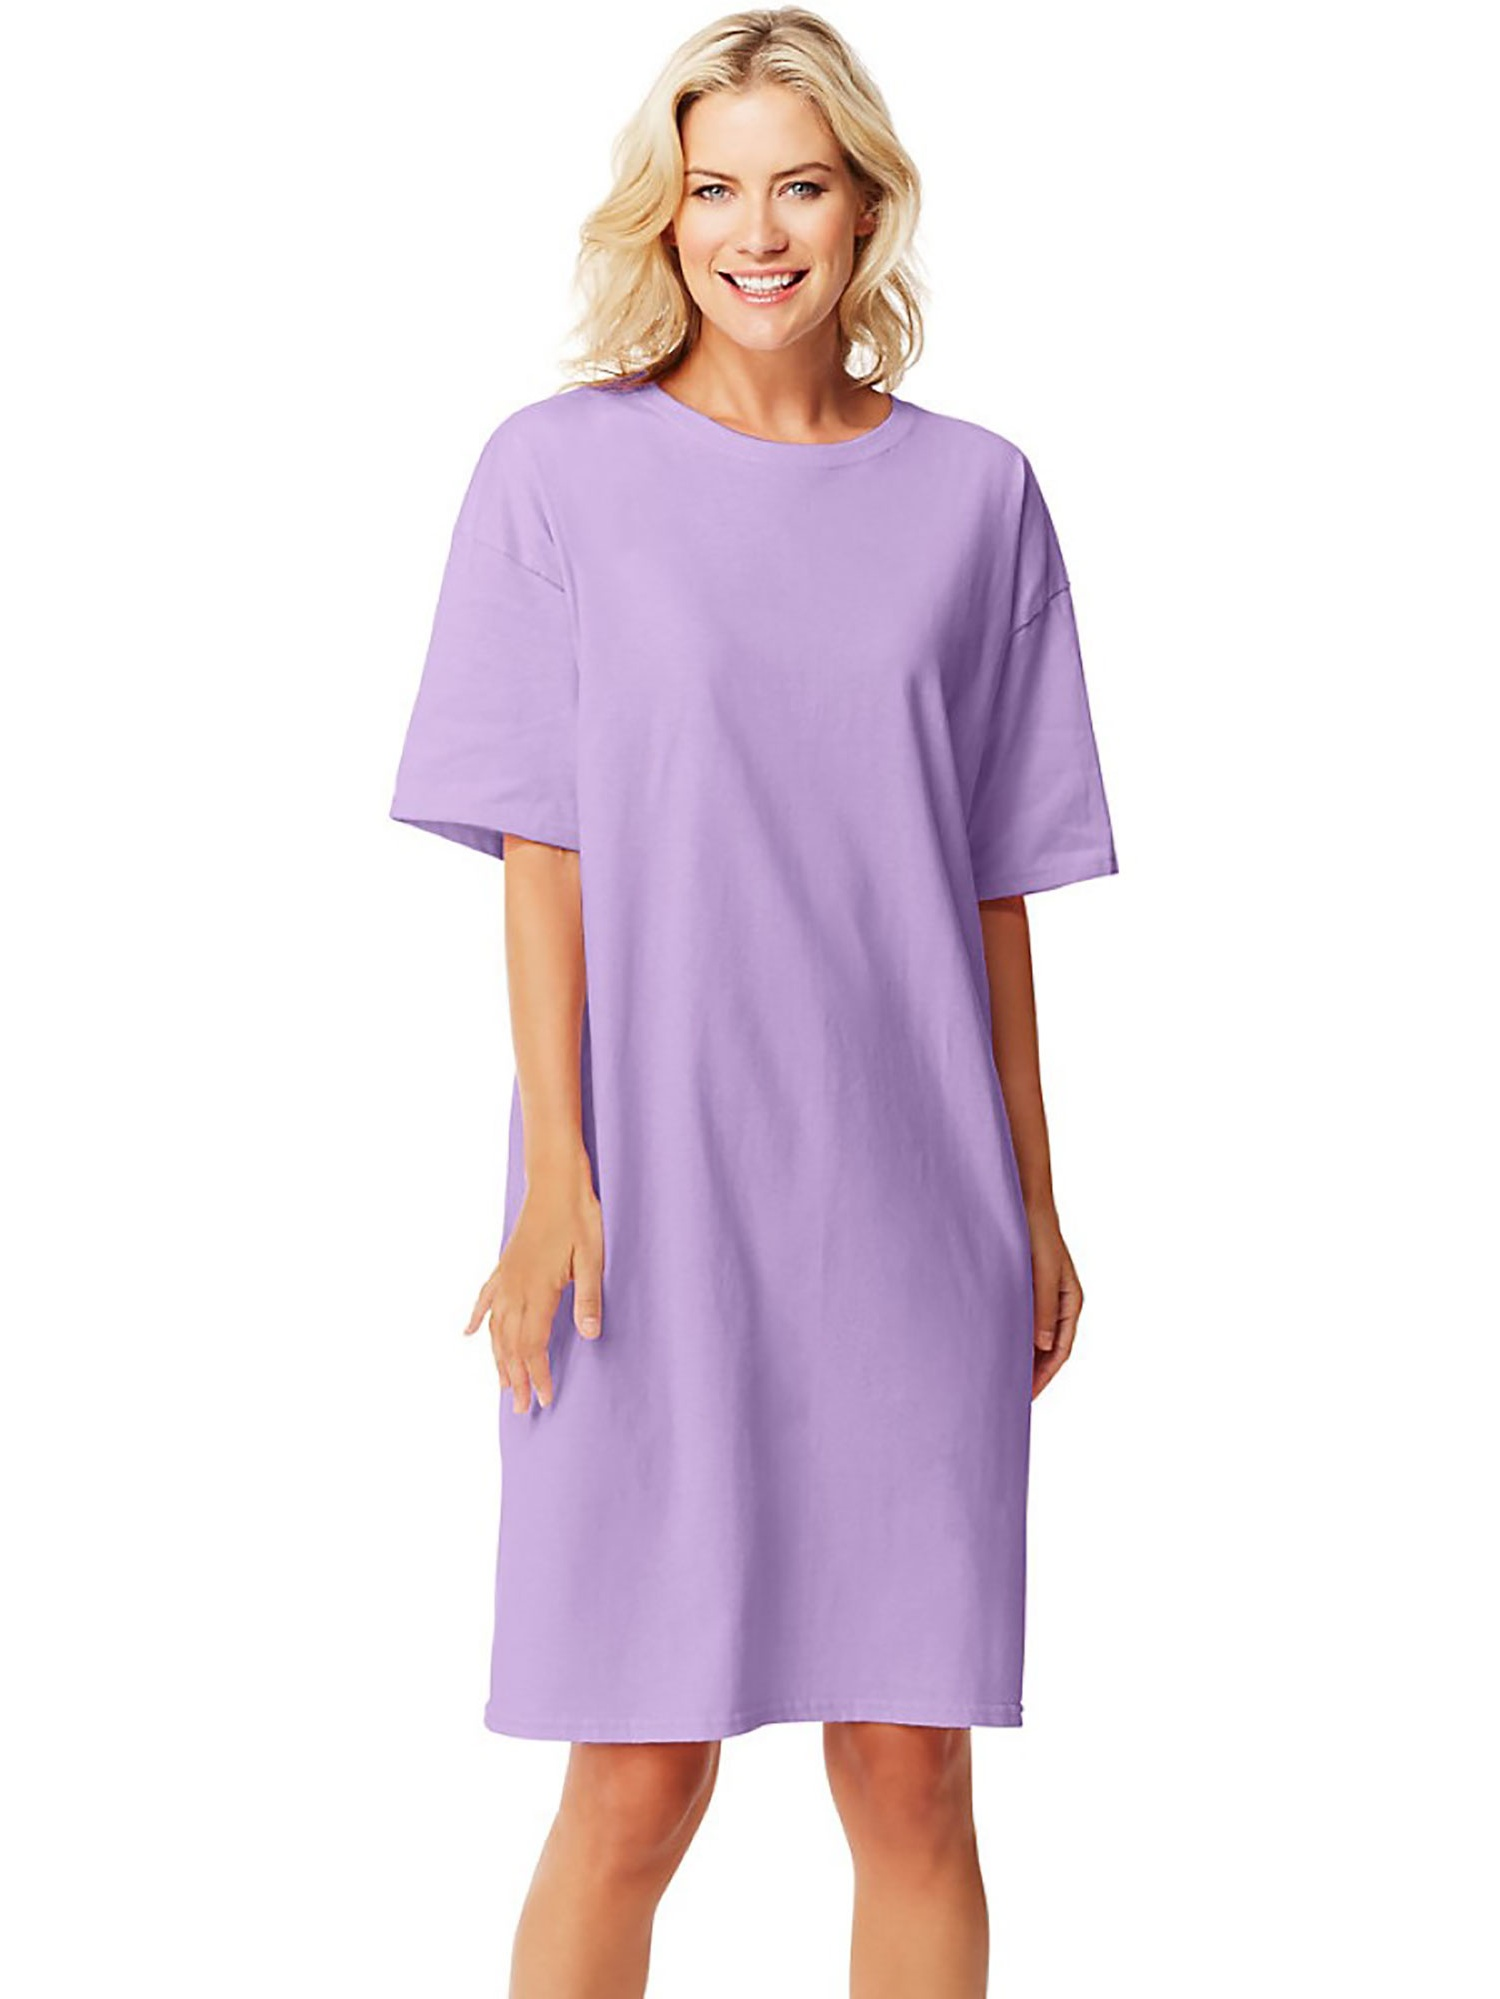 Hanes Women's Wear Around Long T-Shirt, Style 5660